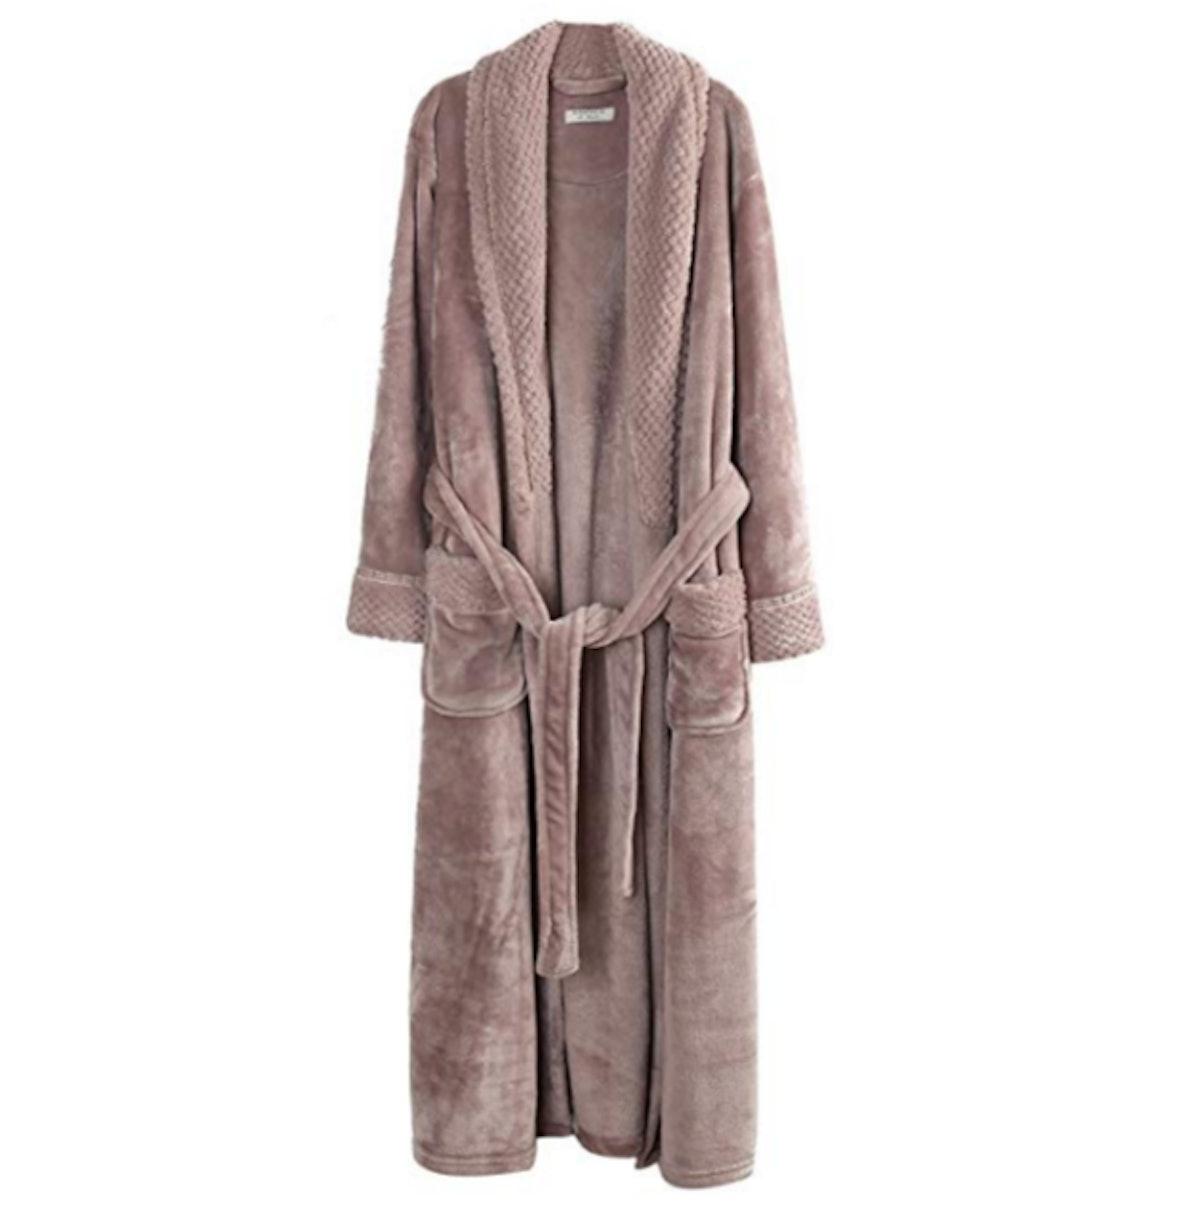 Richie House Women's Plush Soft Warm Fleece Bathrobe Robe